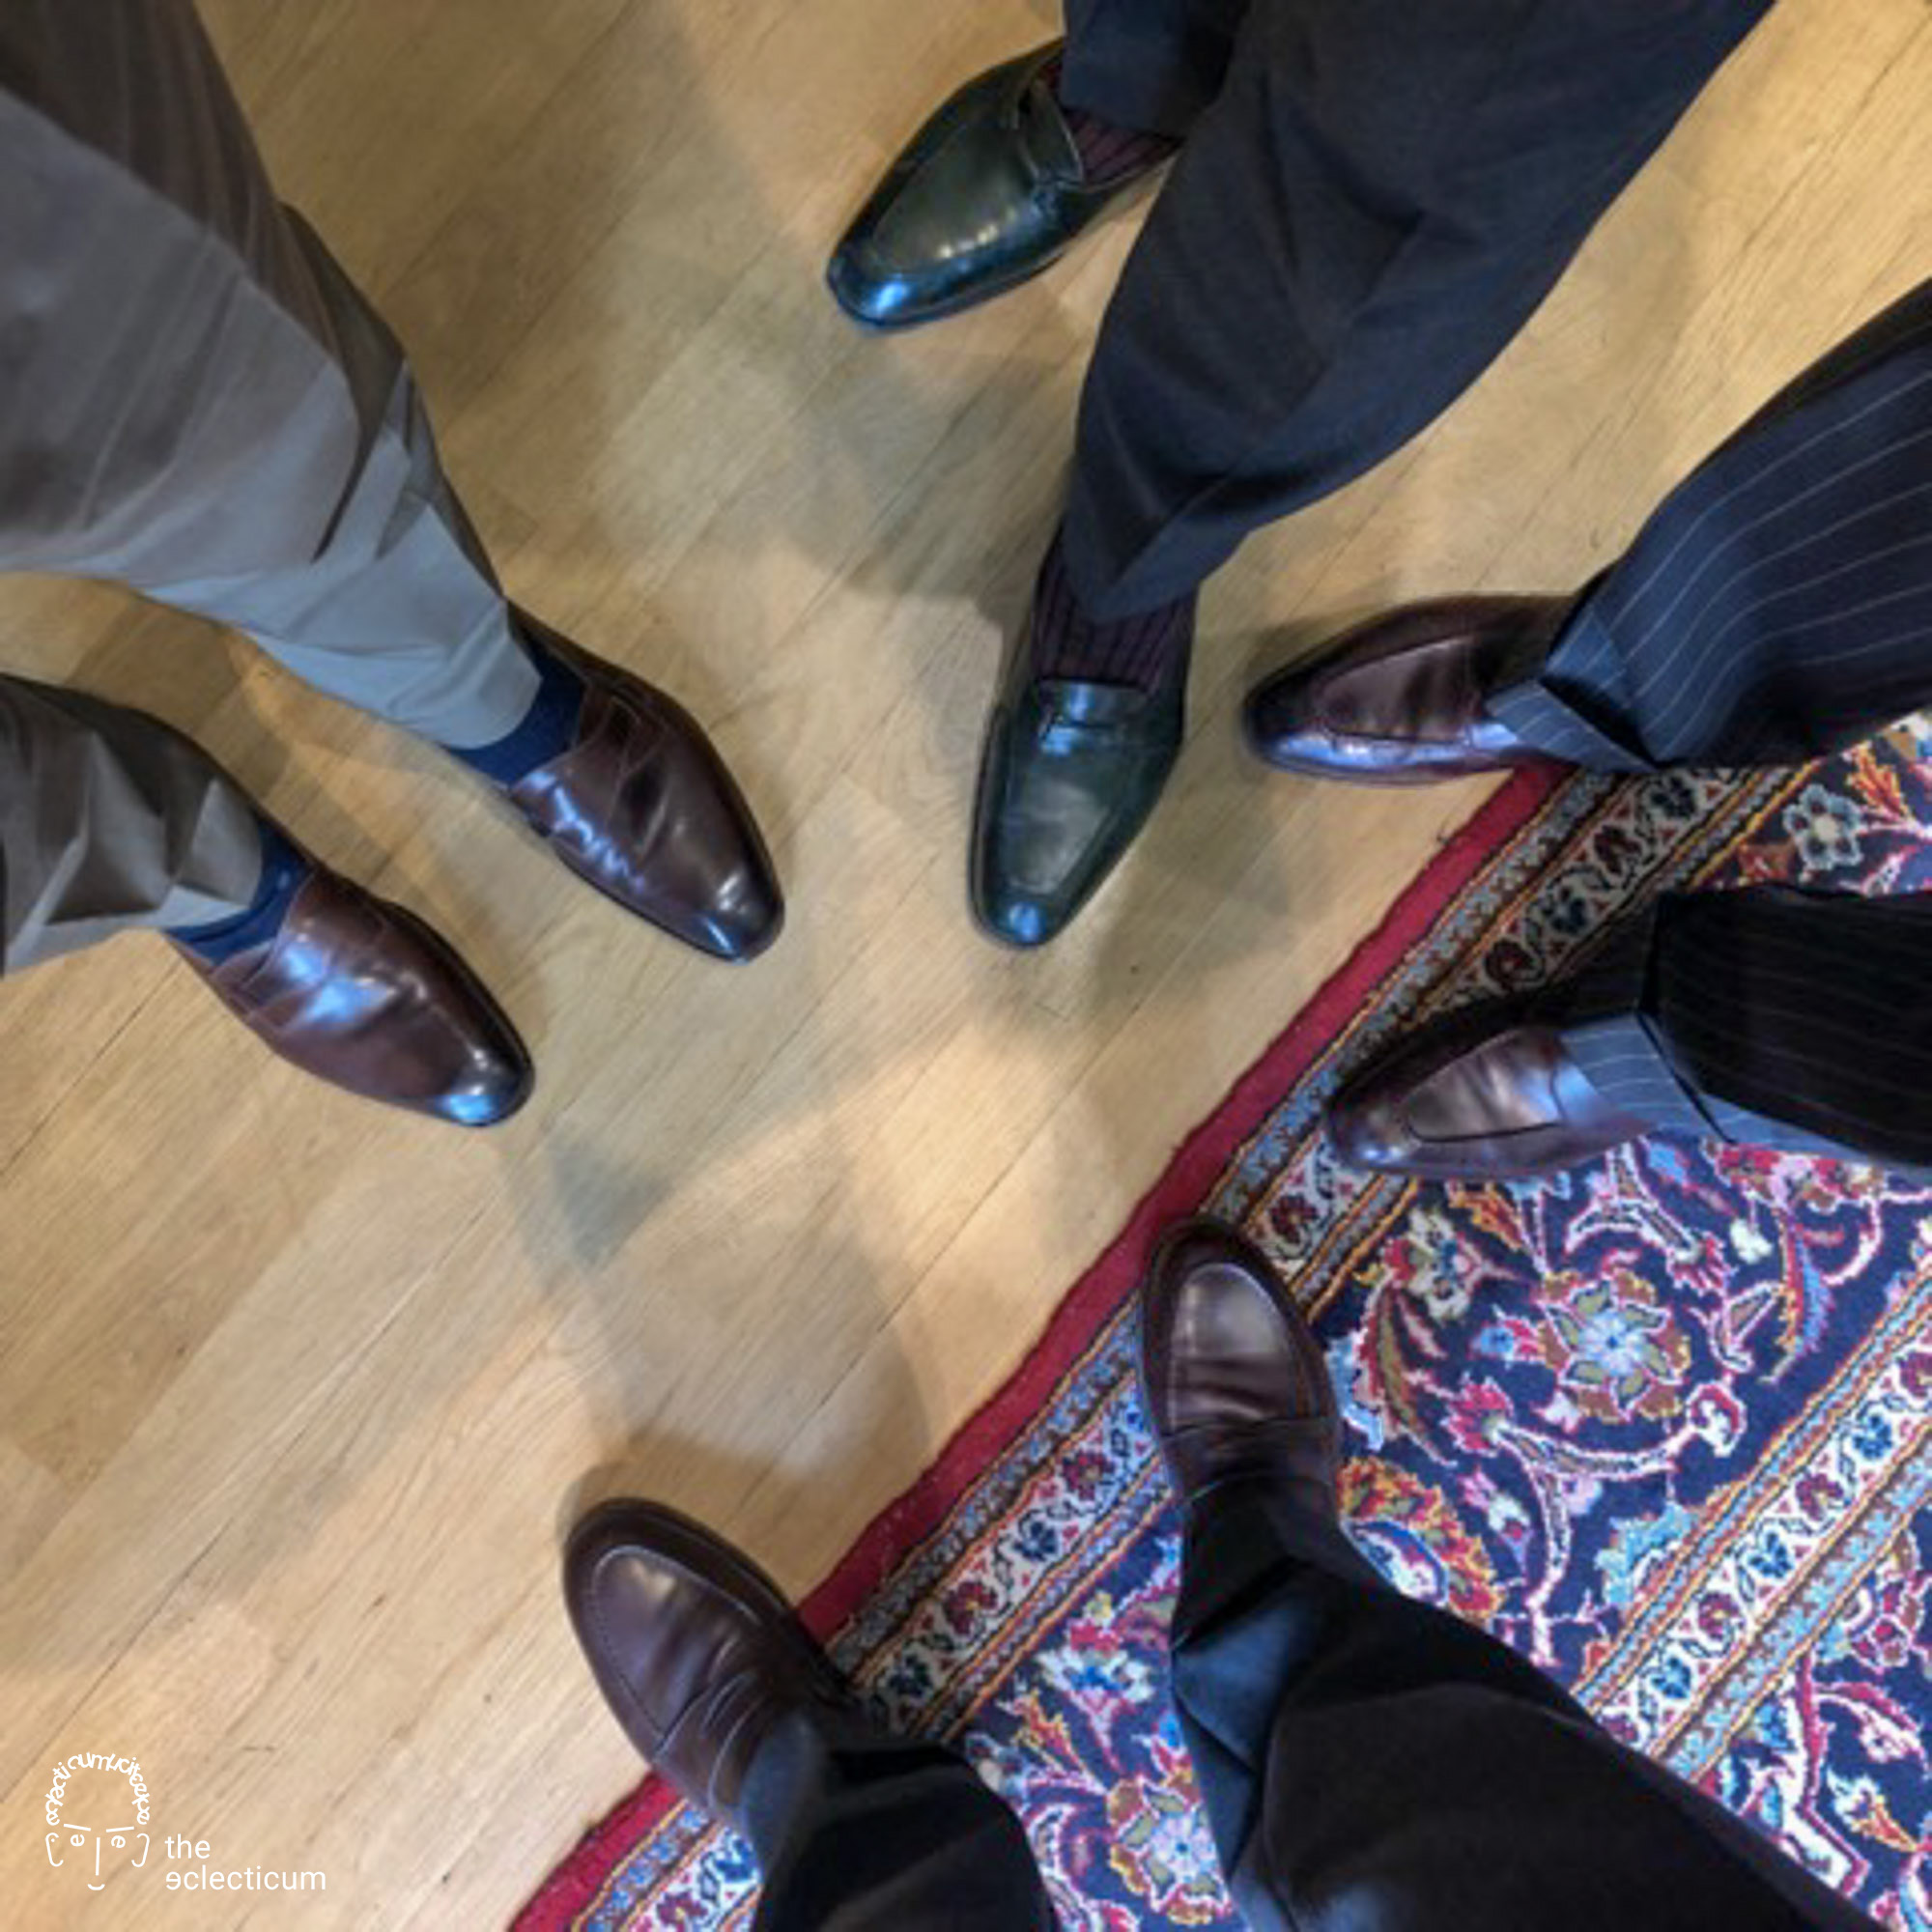 loafers shoes Leonard Kahlcke